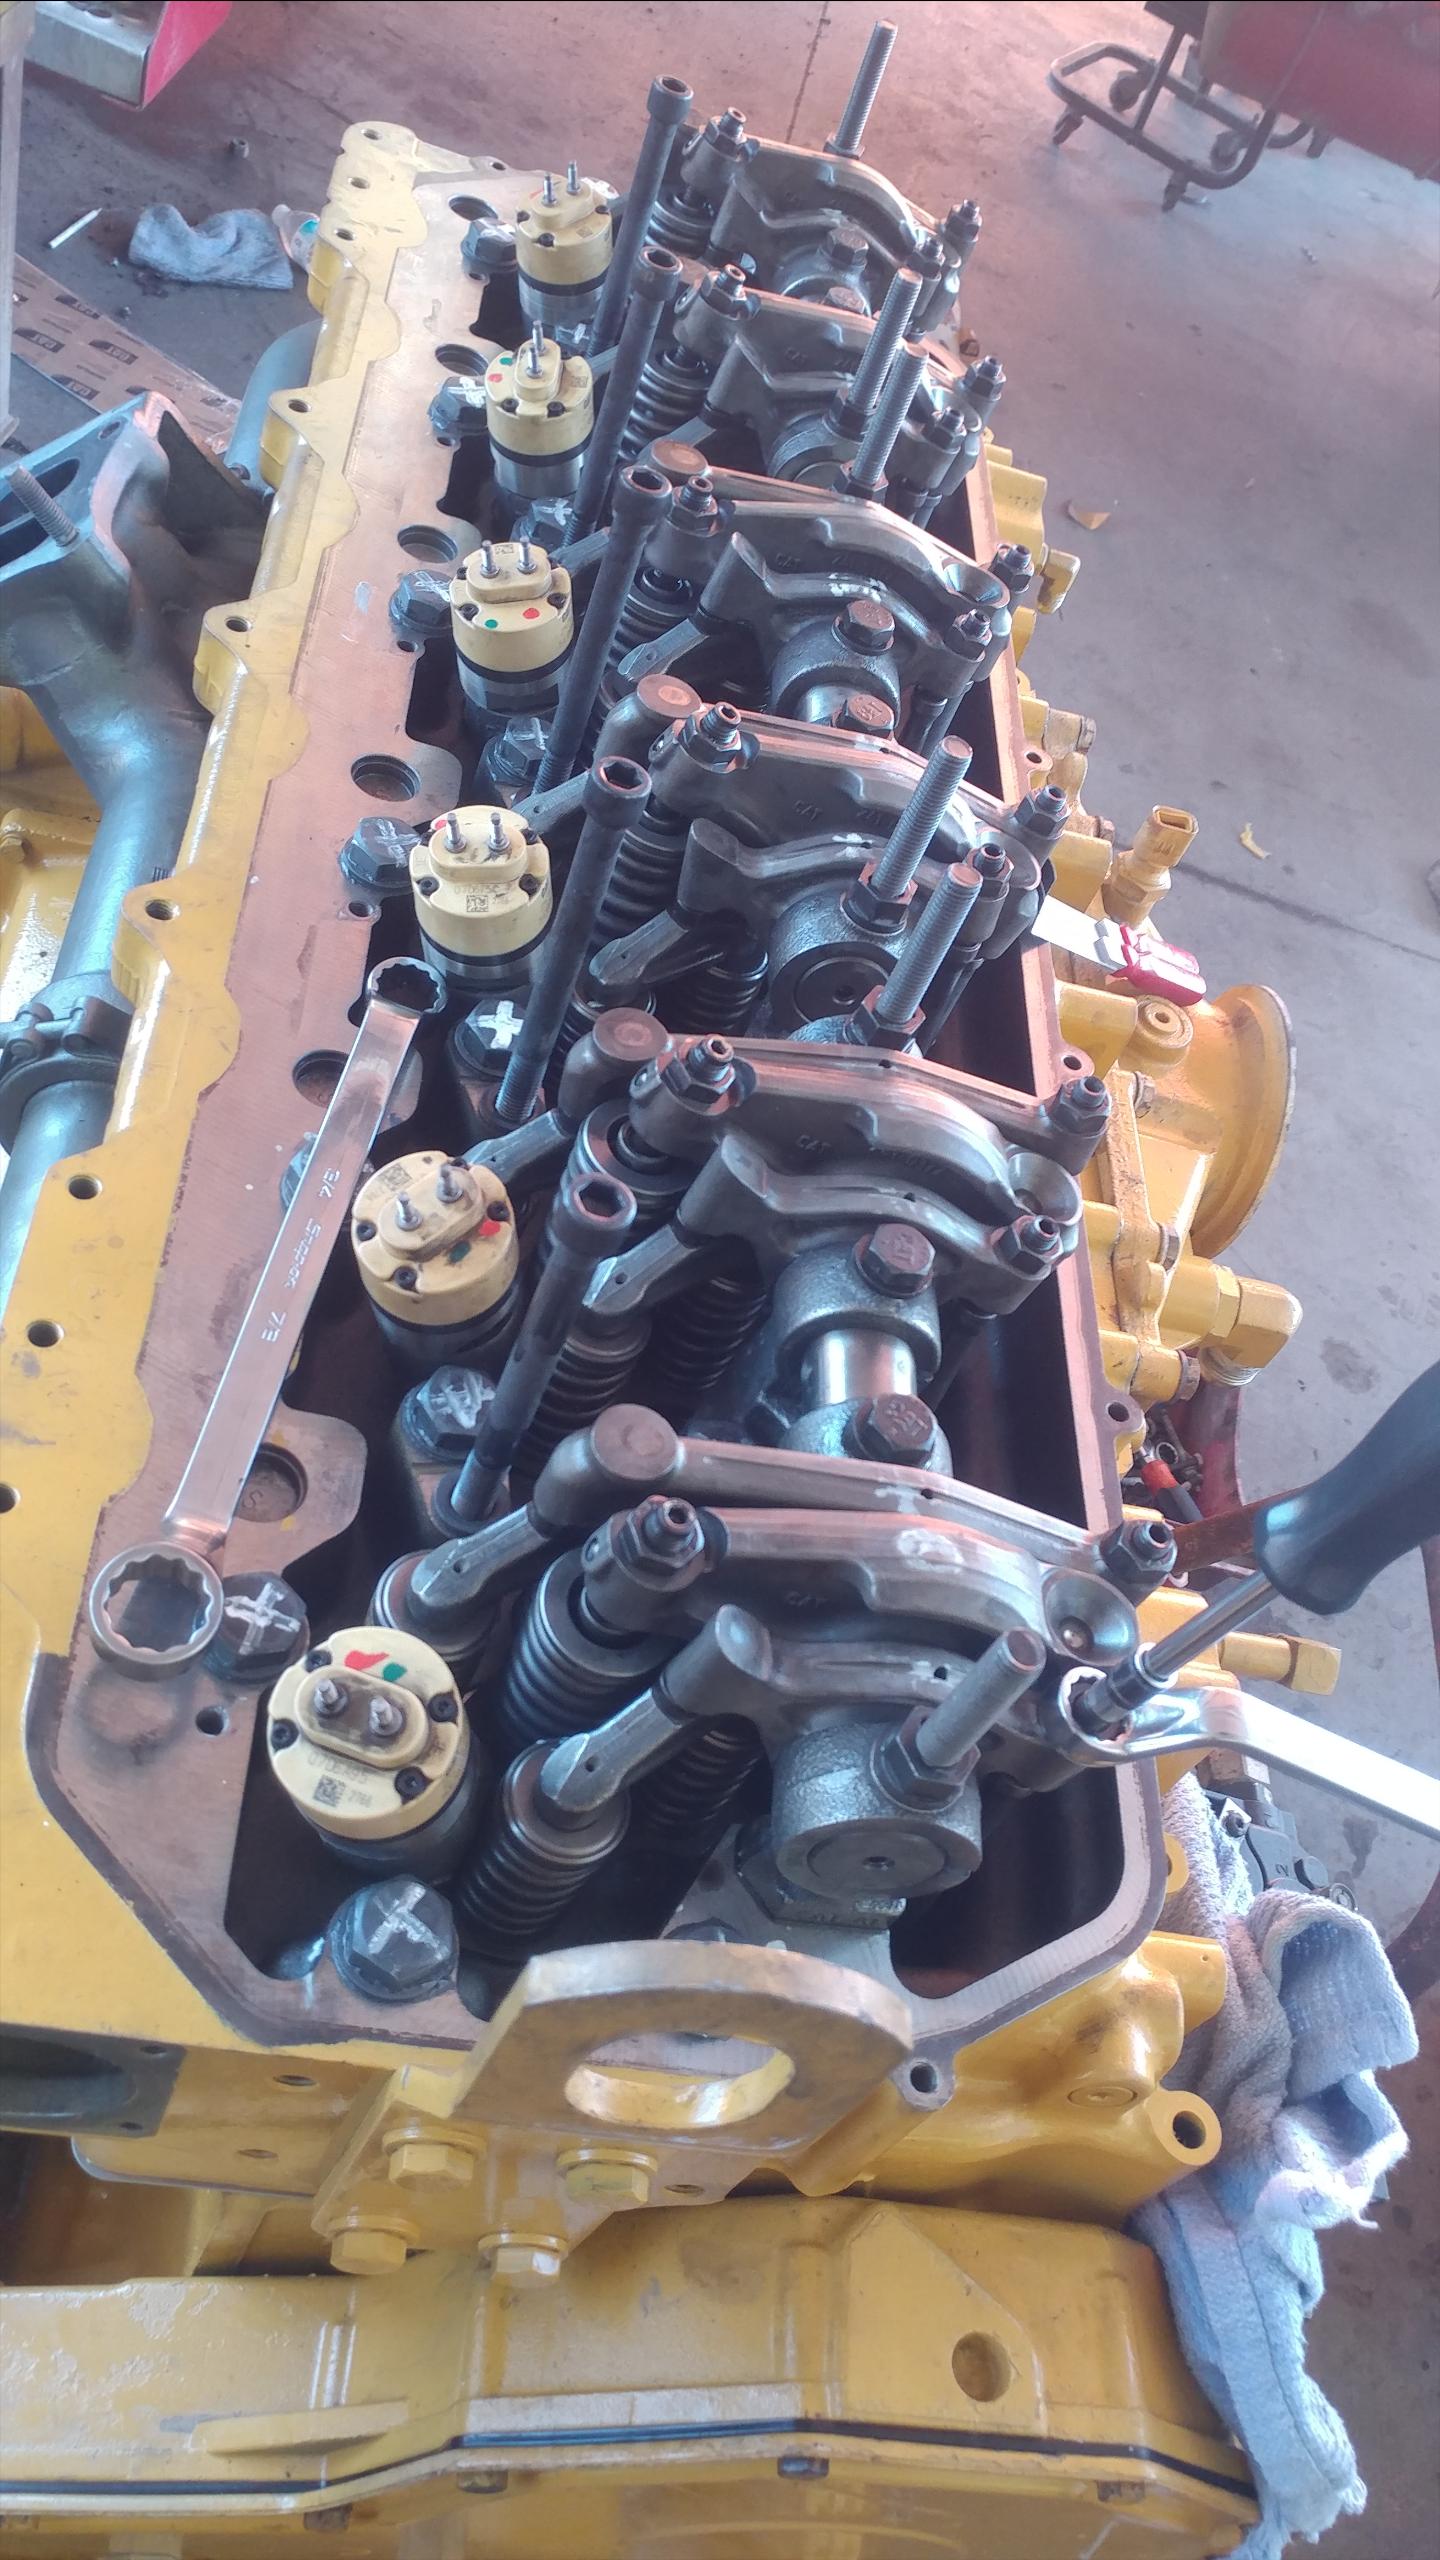 Cat c13 I'm working on a cat C13 and I put all the gears like at the